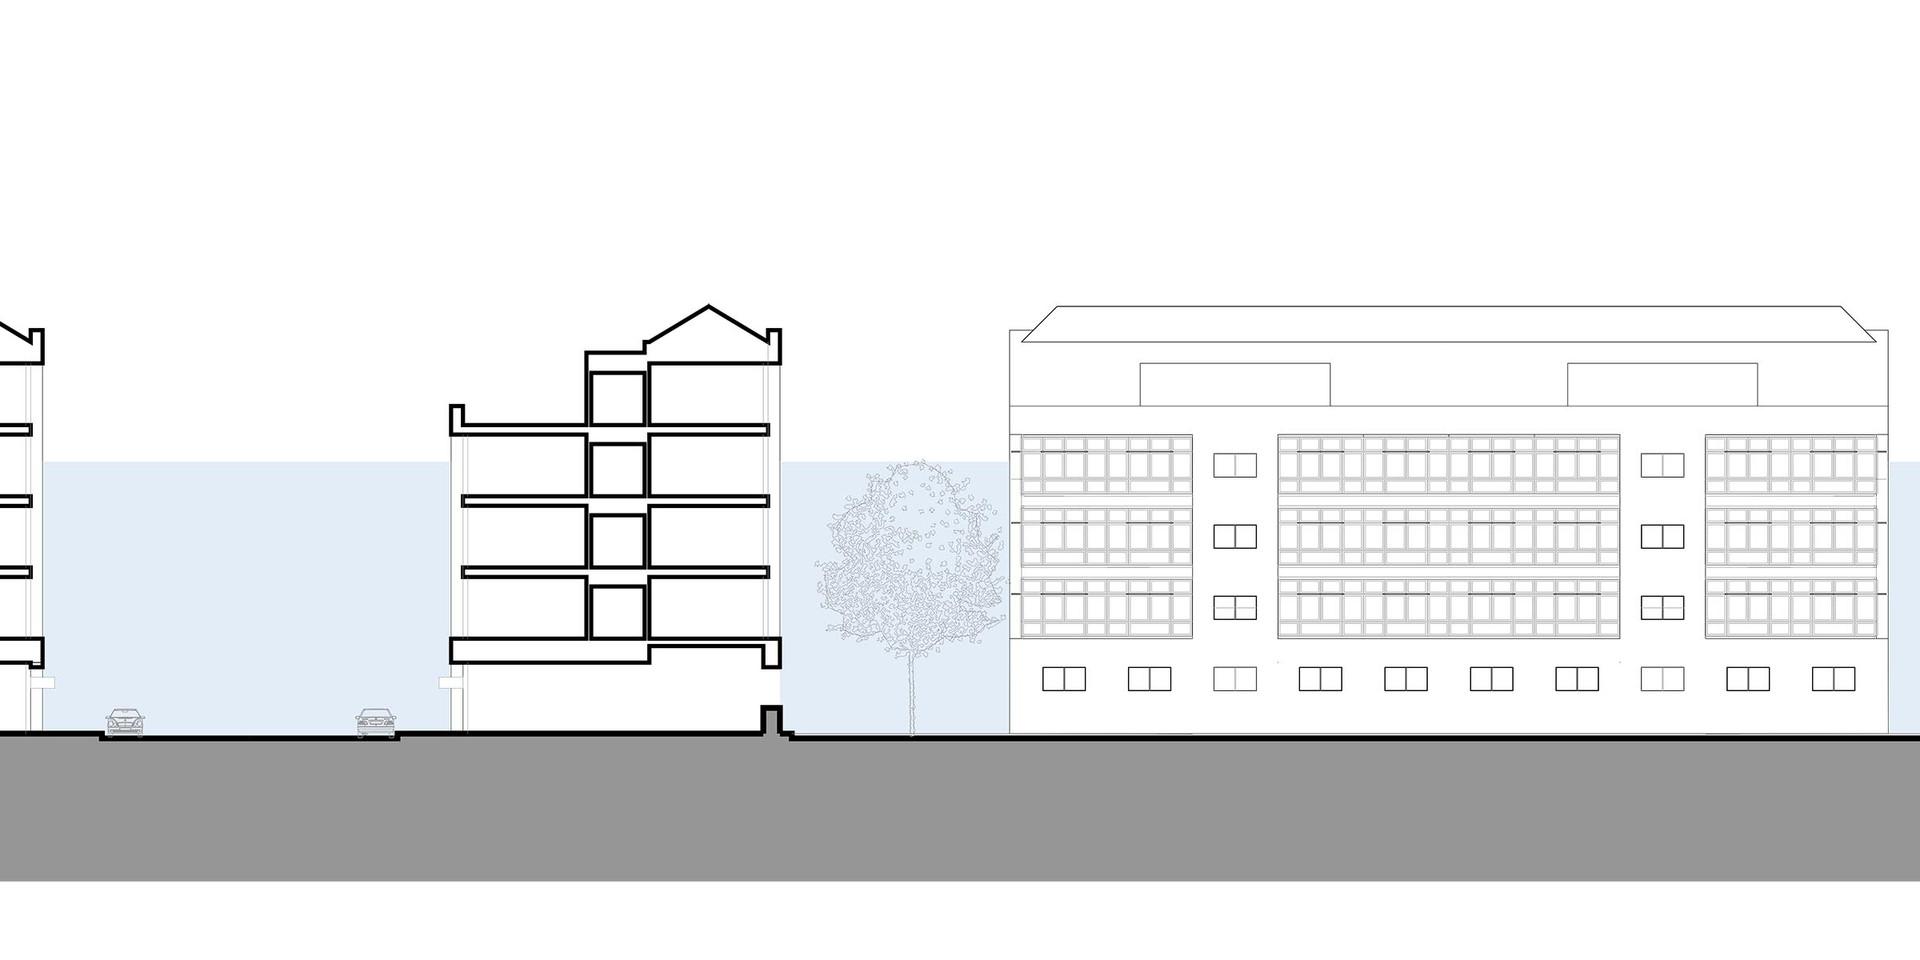 Zim Masterplan Building Type 1 Section